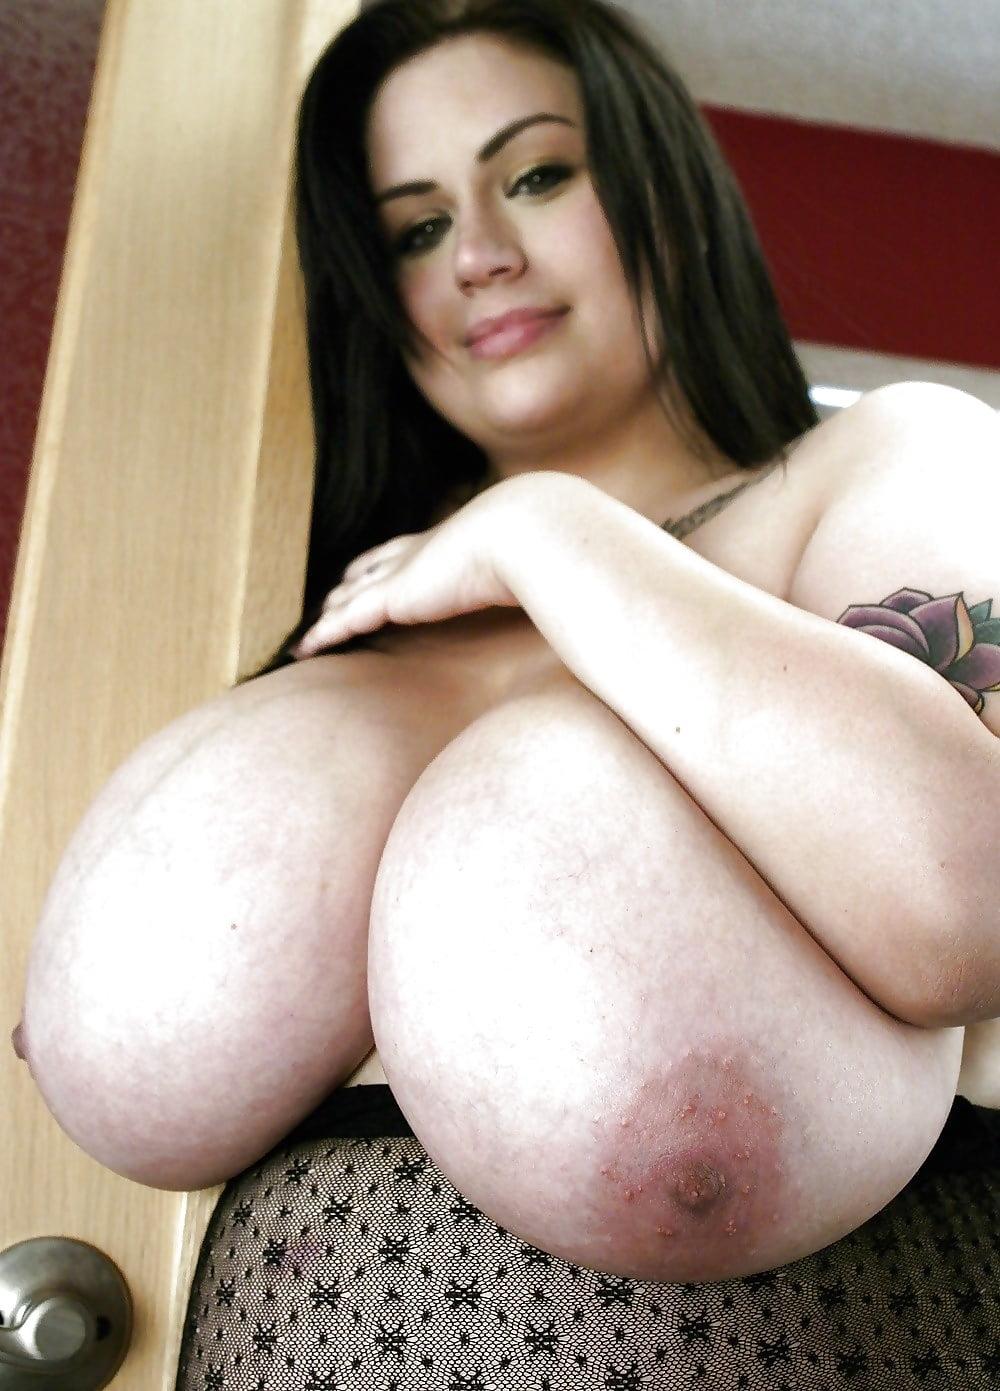 Bbw all natural huge boobs